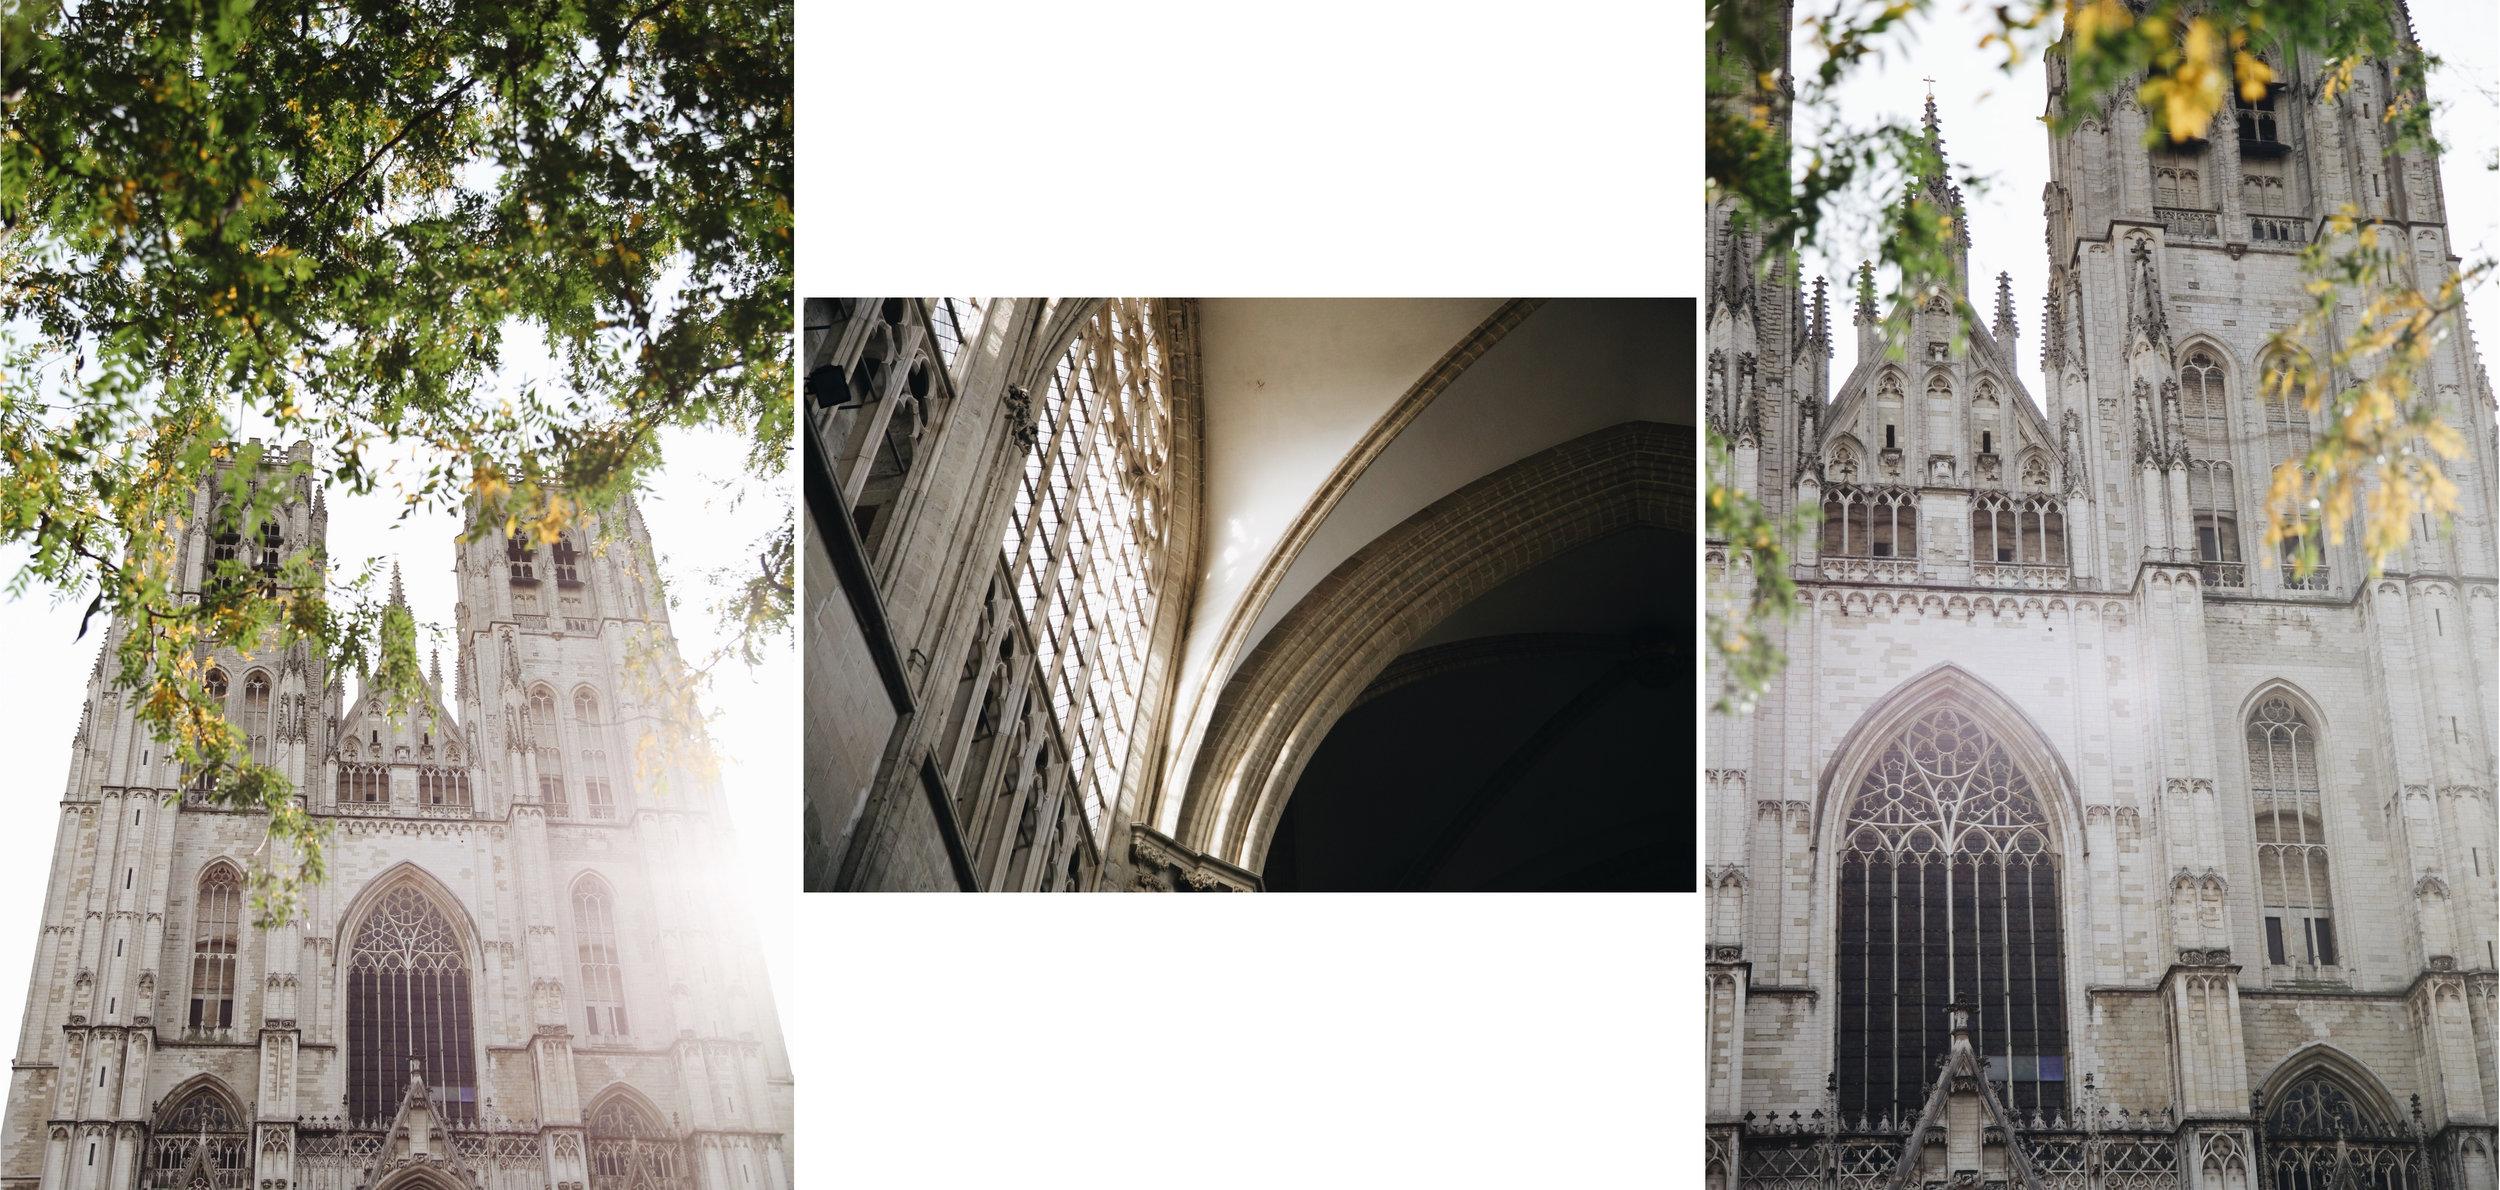 bruxelles-cathédrale-que-visiter-belgique-onmyway-blog.JPG